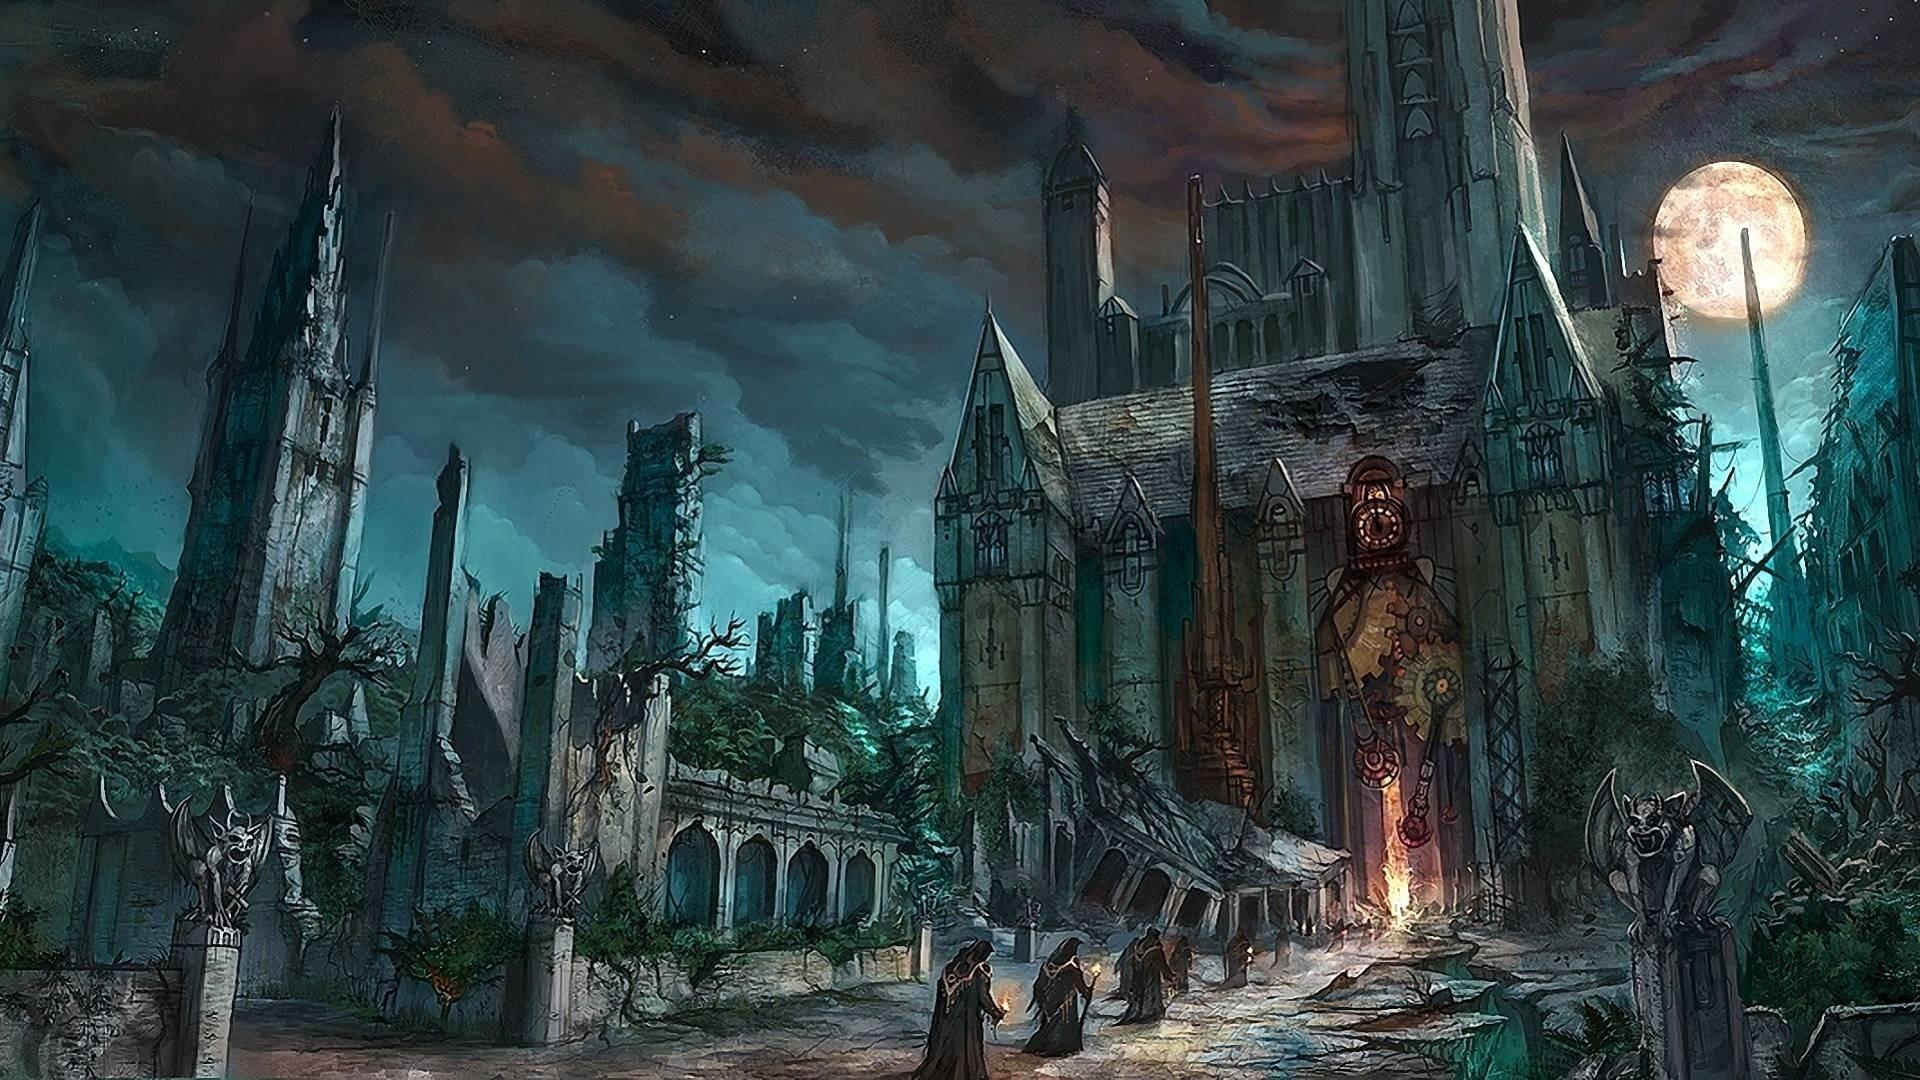 Gothic Castle hd wallpaper download